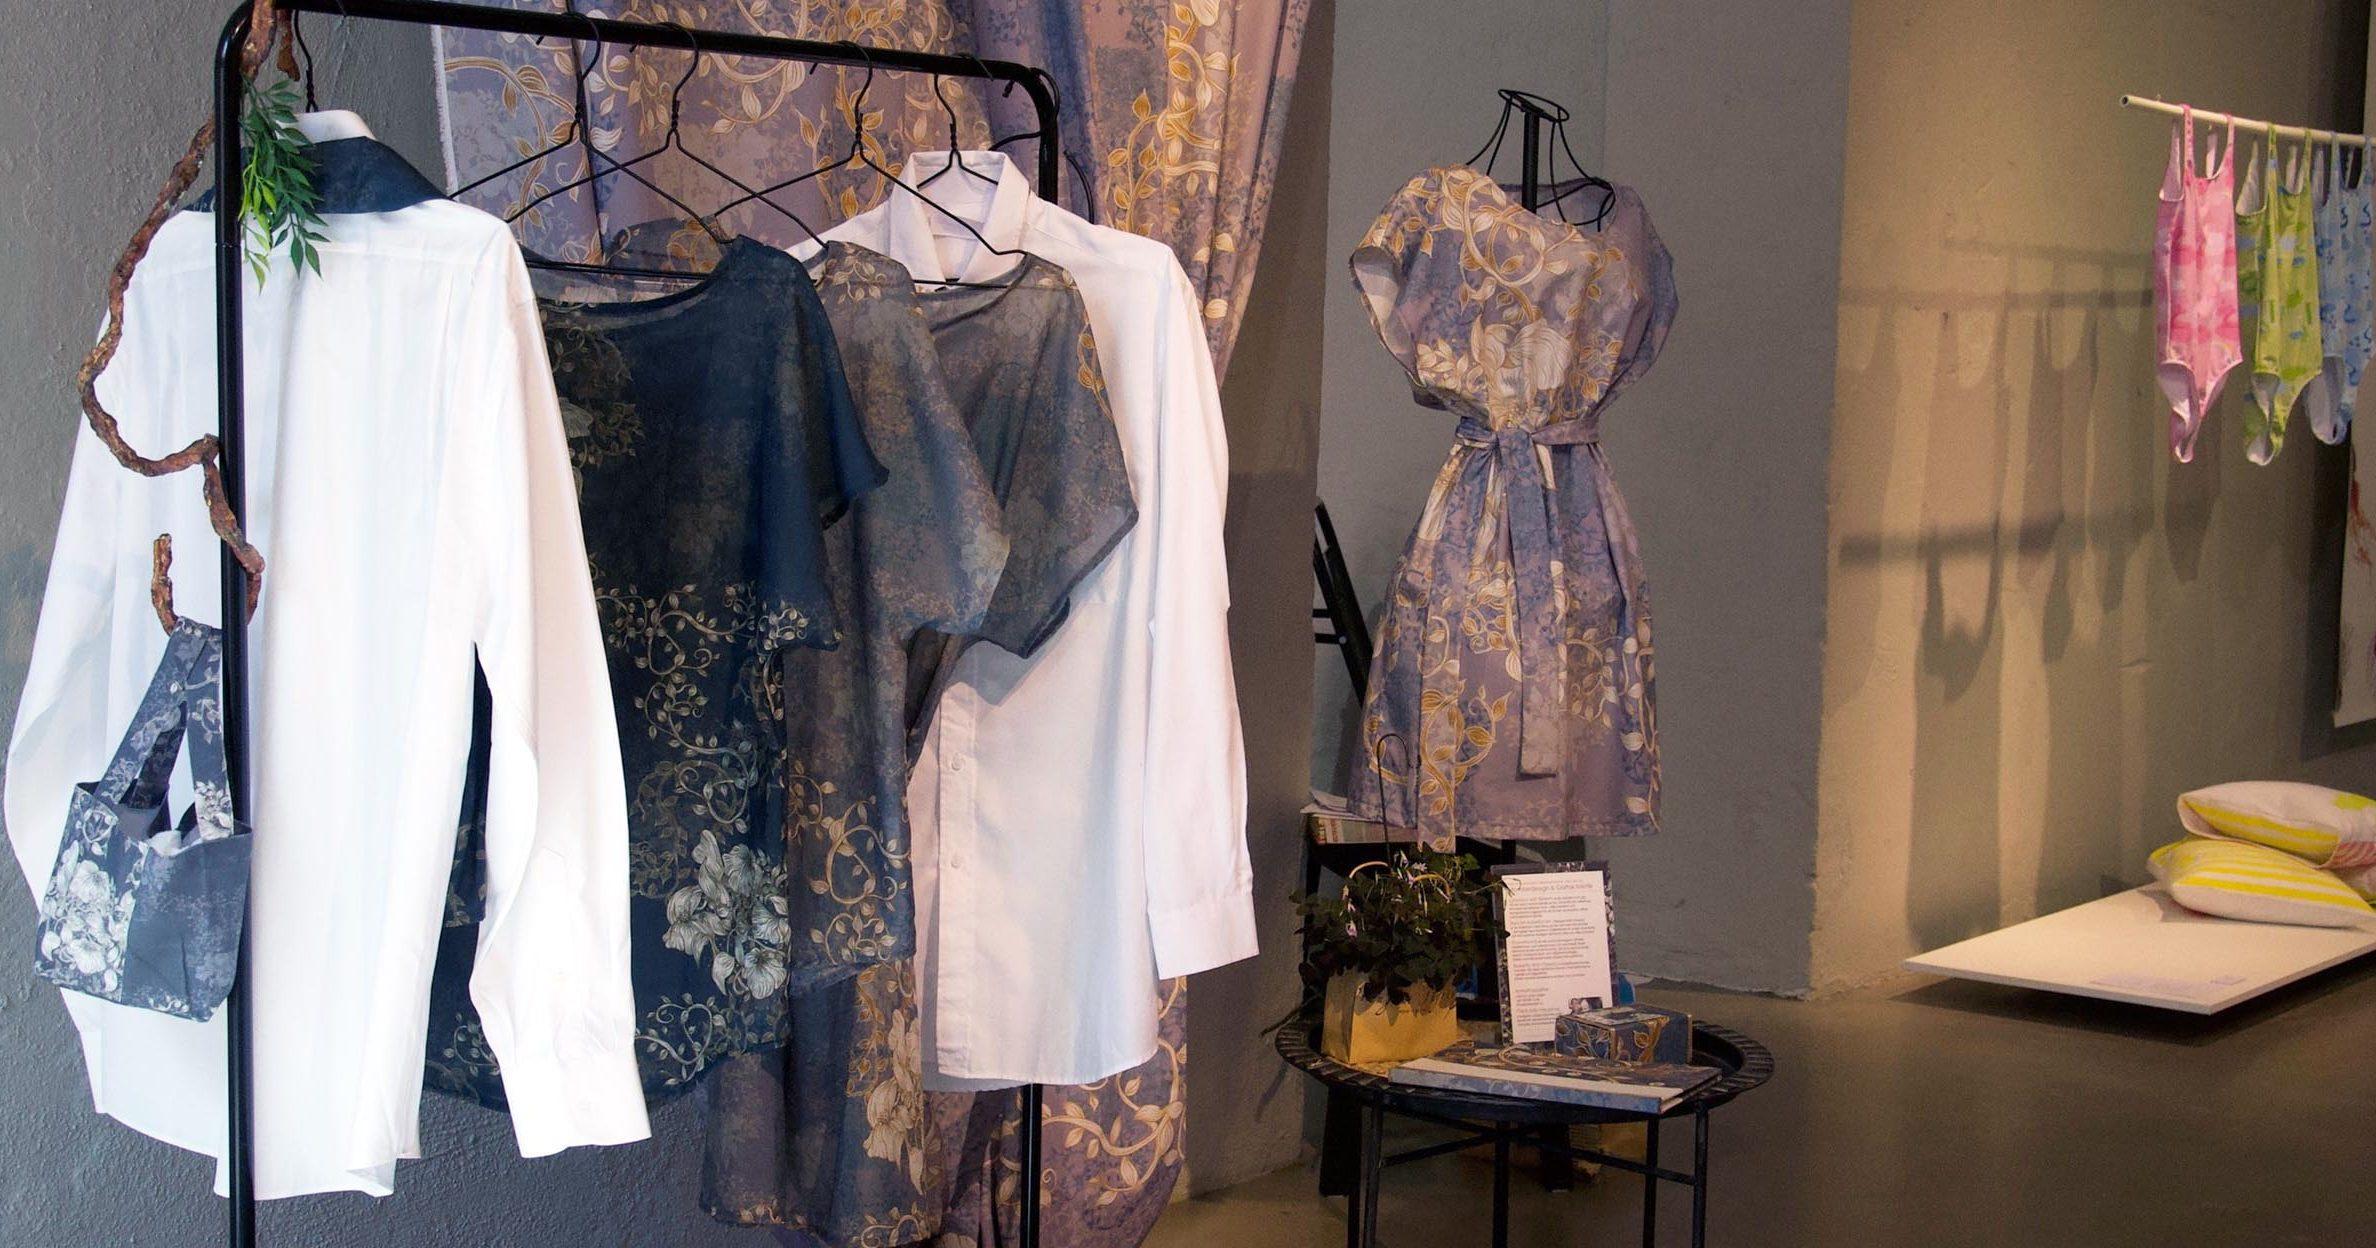 mönsterdesign på kläder